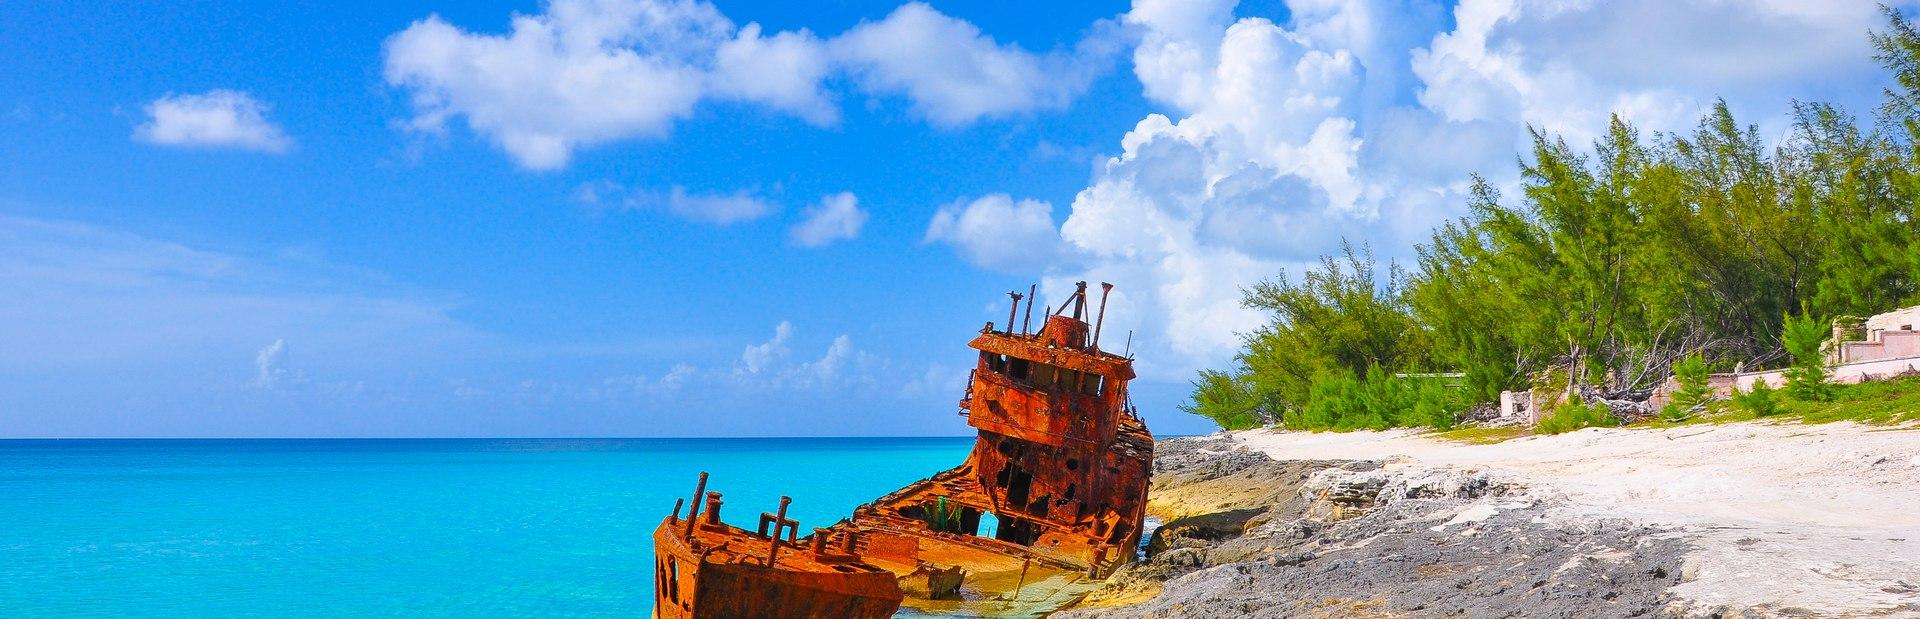 Bimini charter itineraries